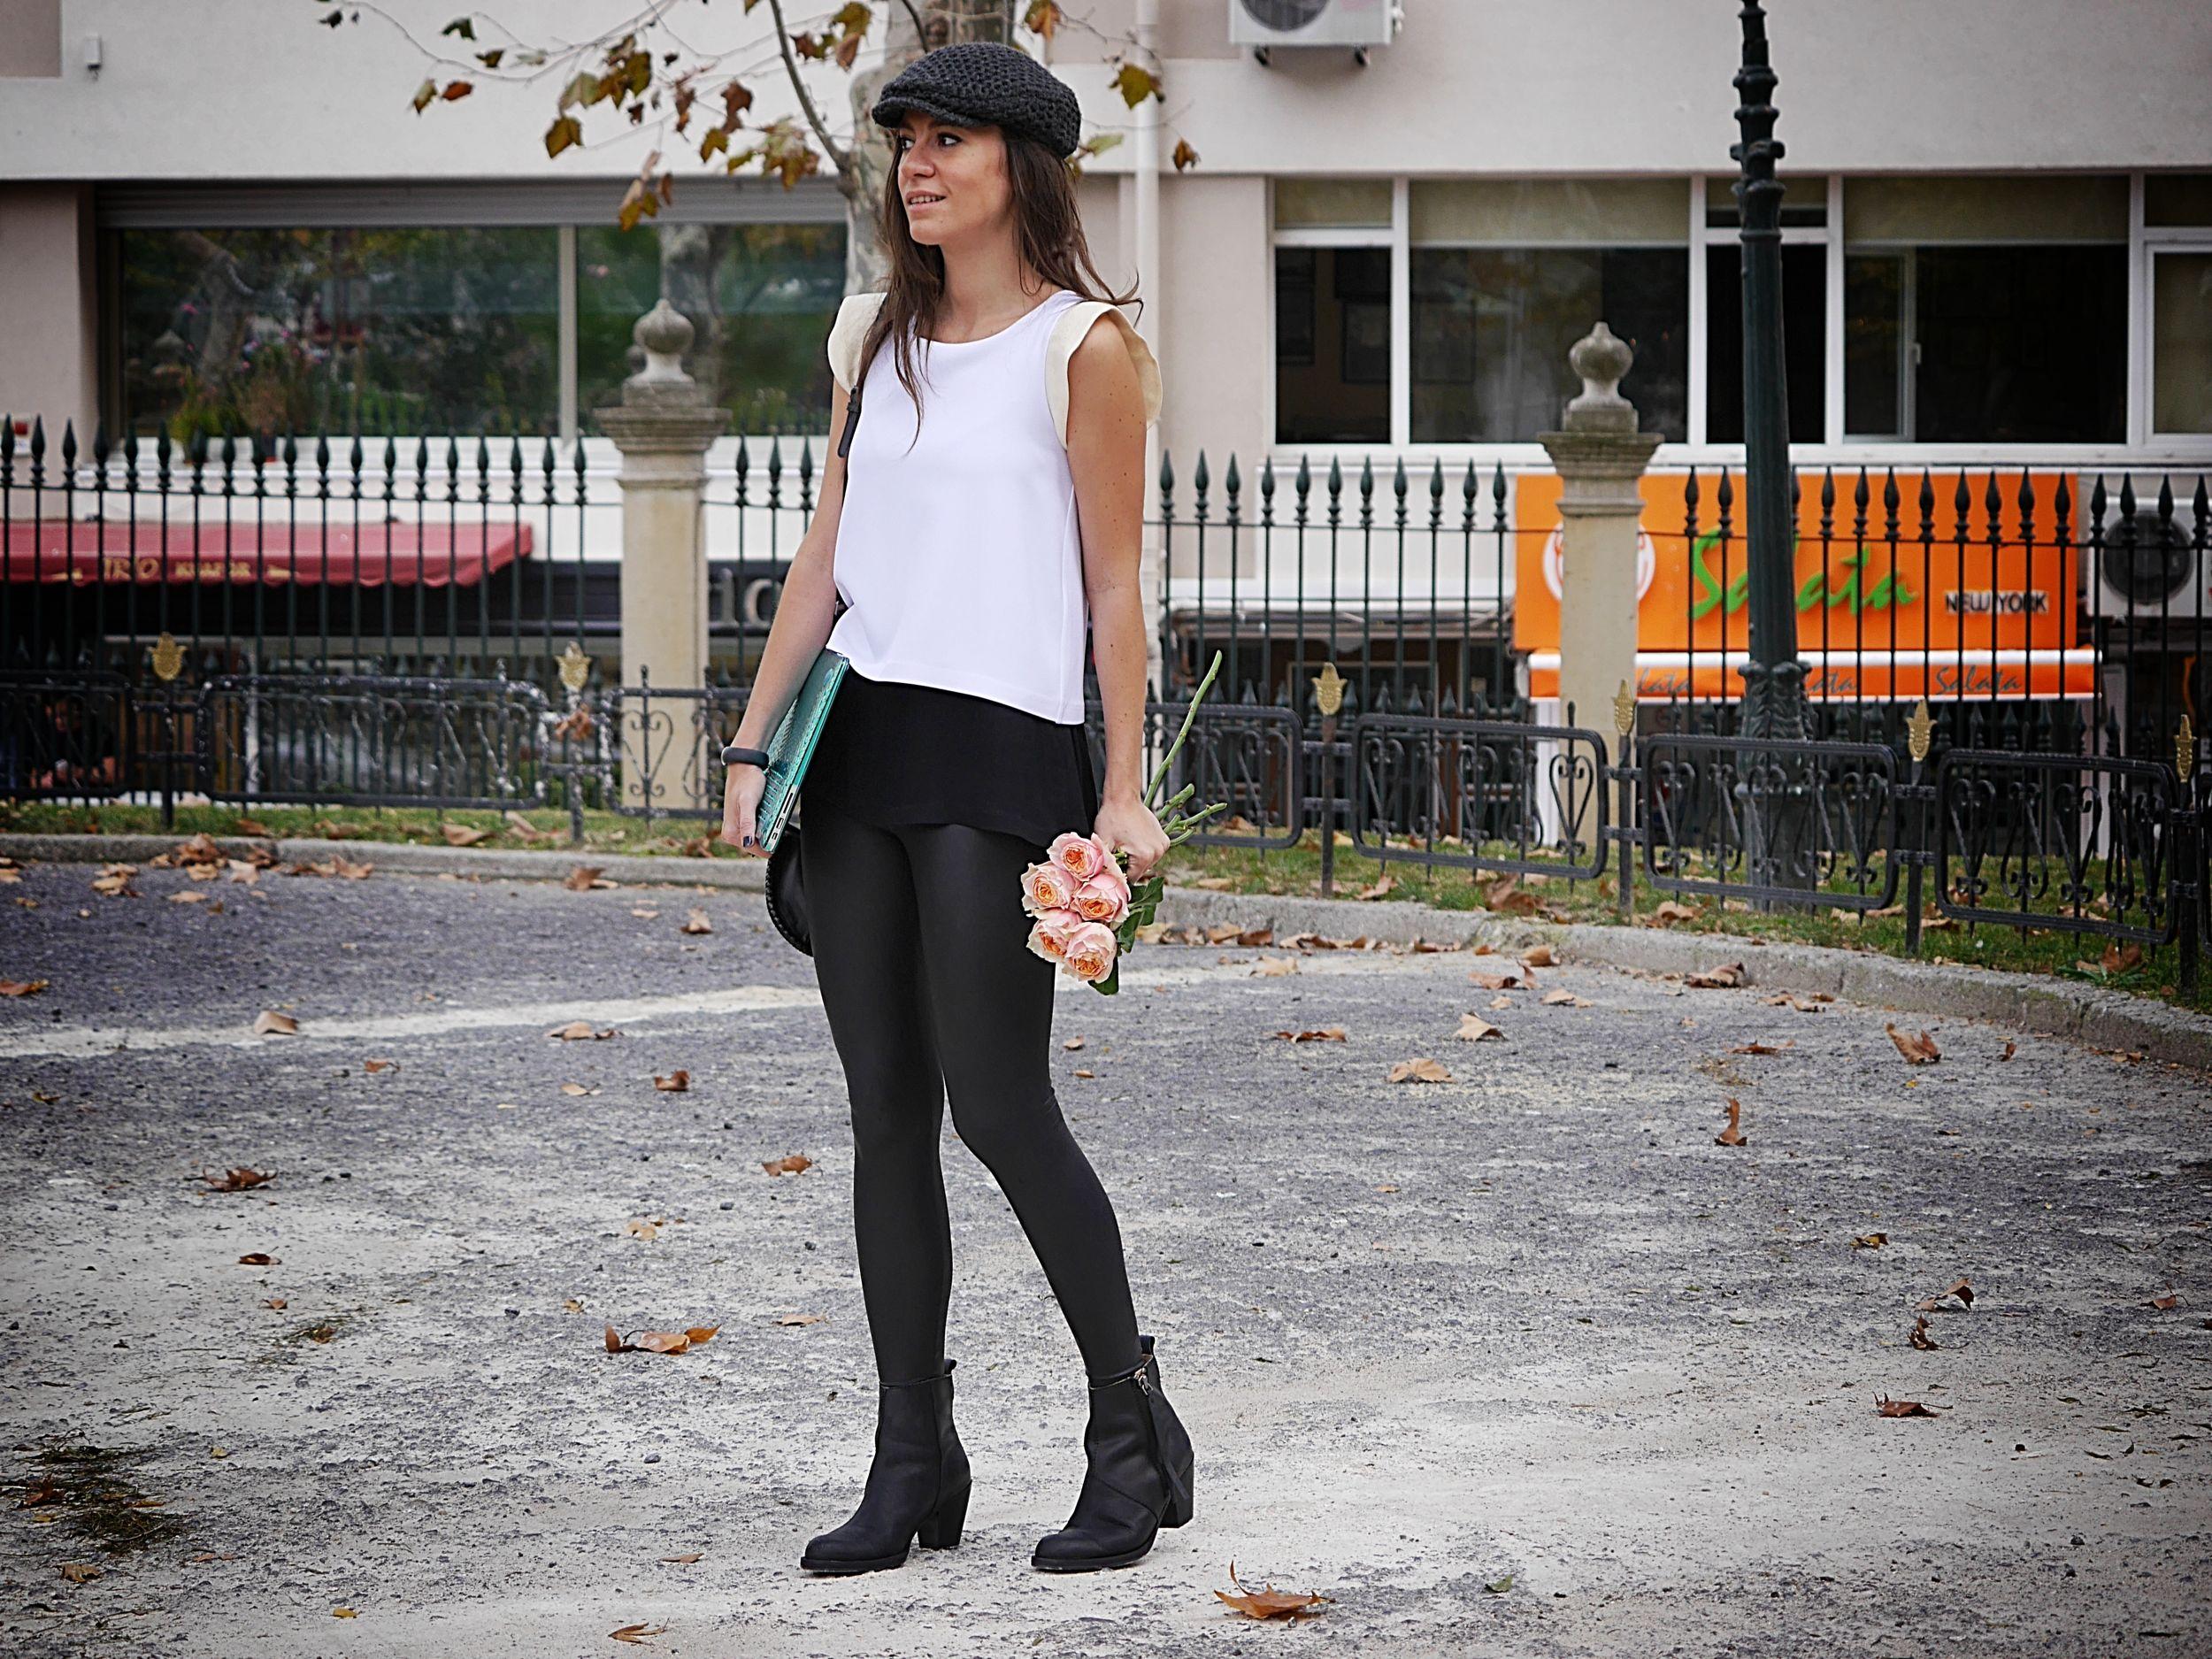 mymija, mija, off ne giysem, outfit, street style